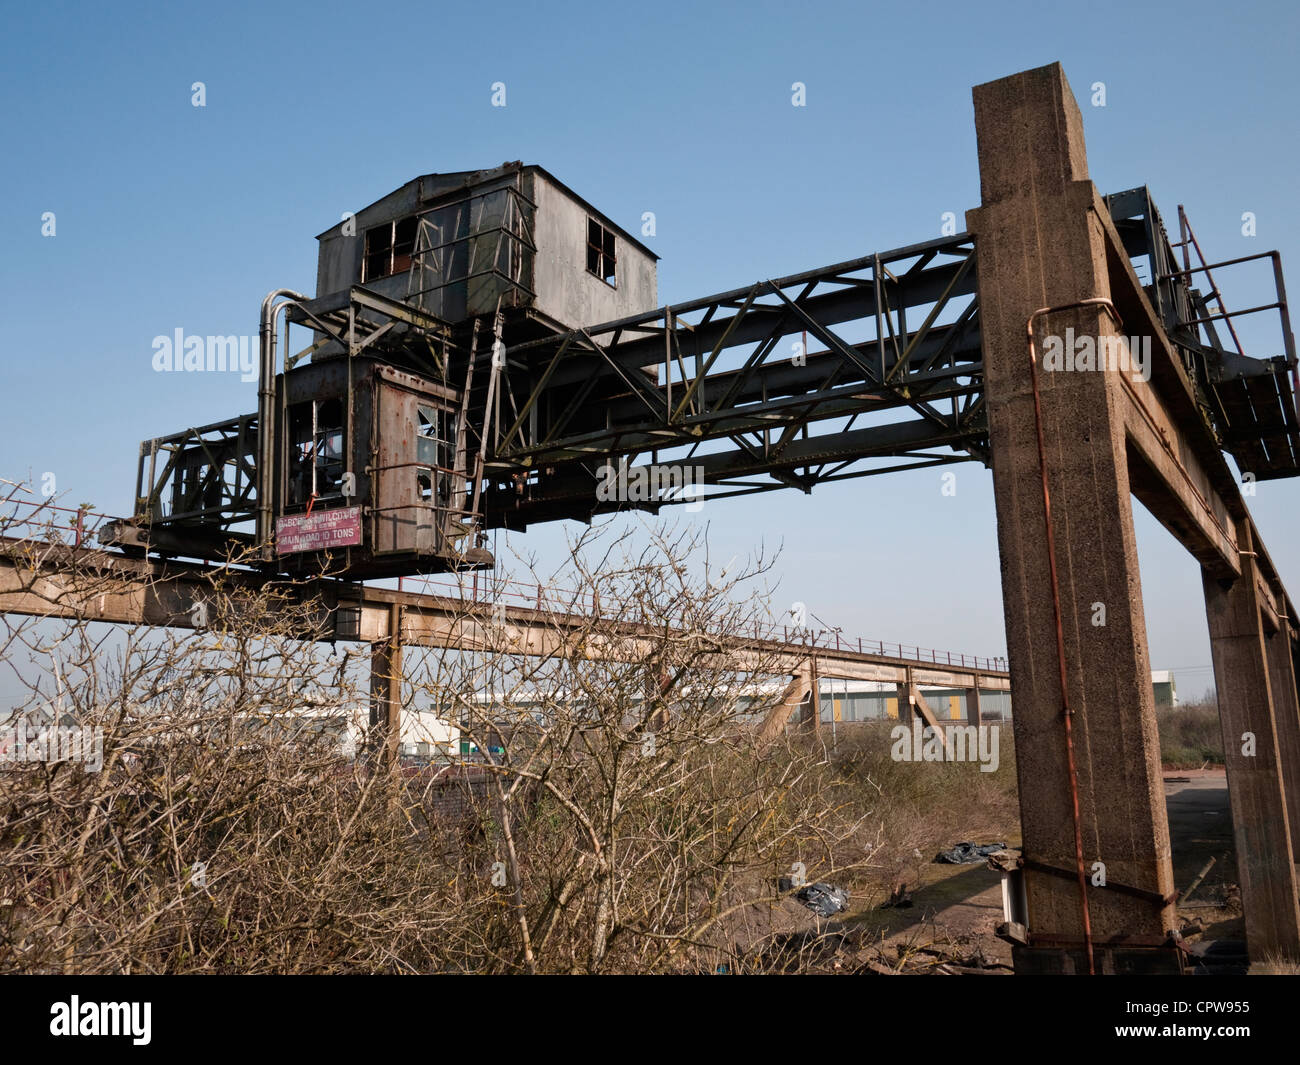 Mobile Gantry Crane Uk : Gantry crane at chillington wharf a derelict grade ii